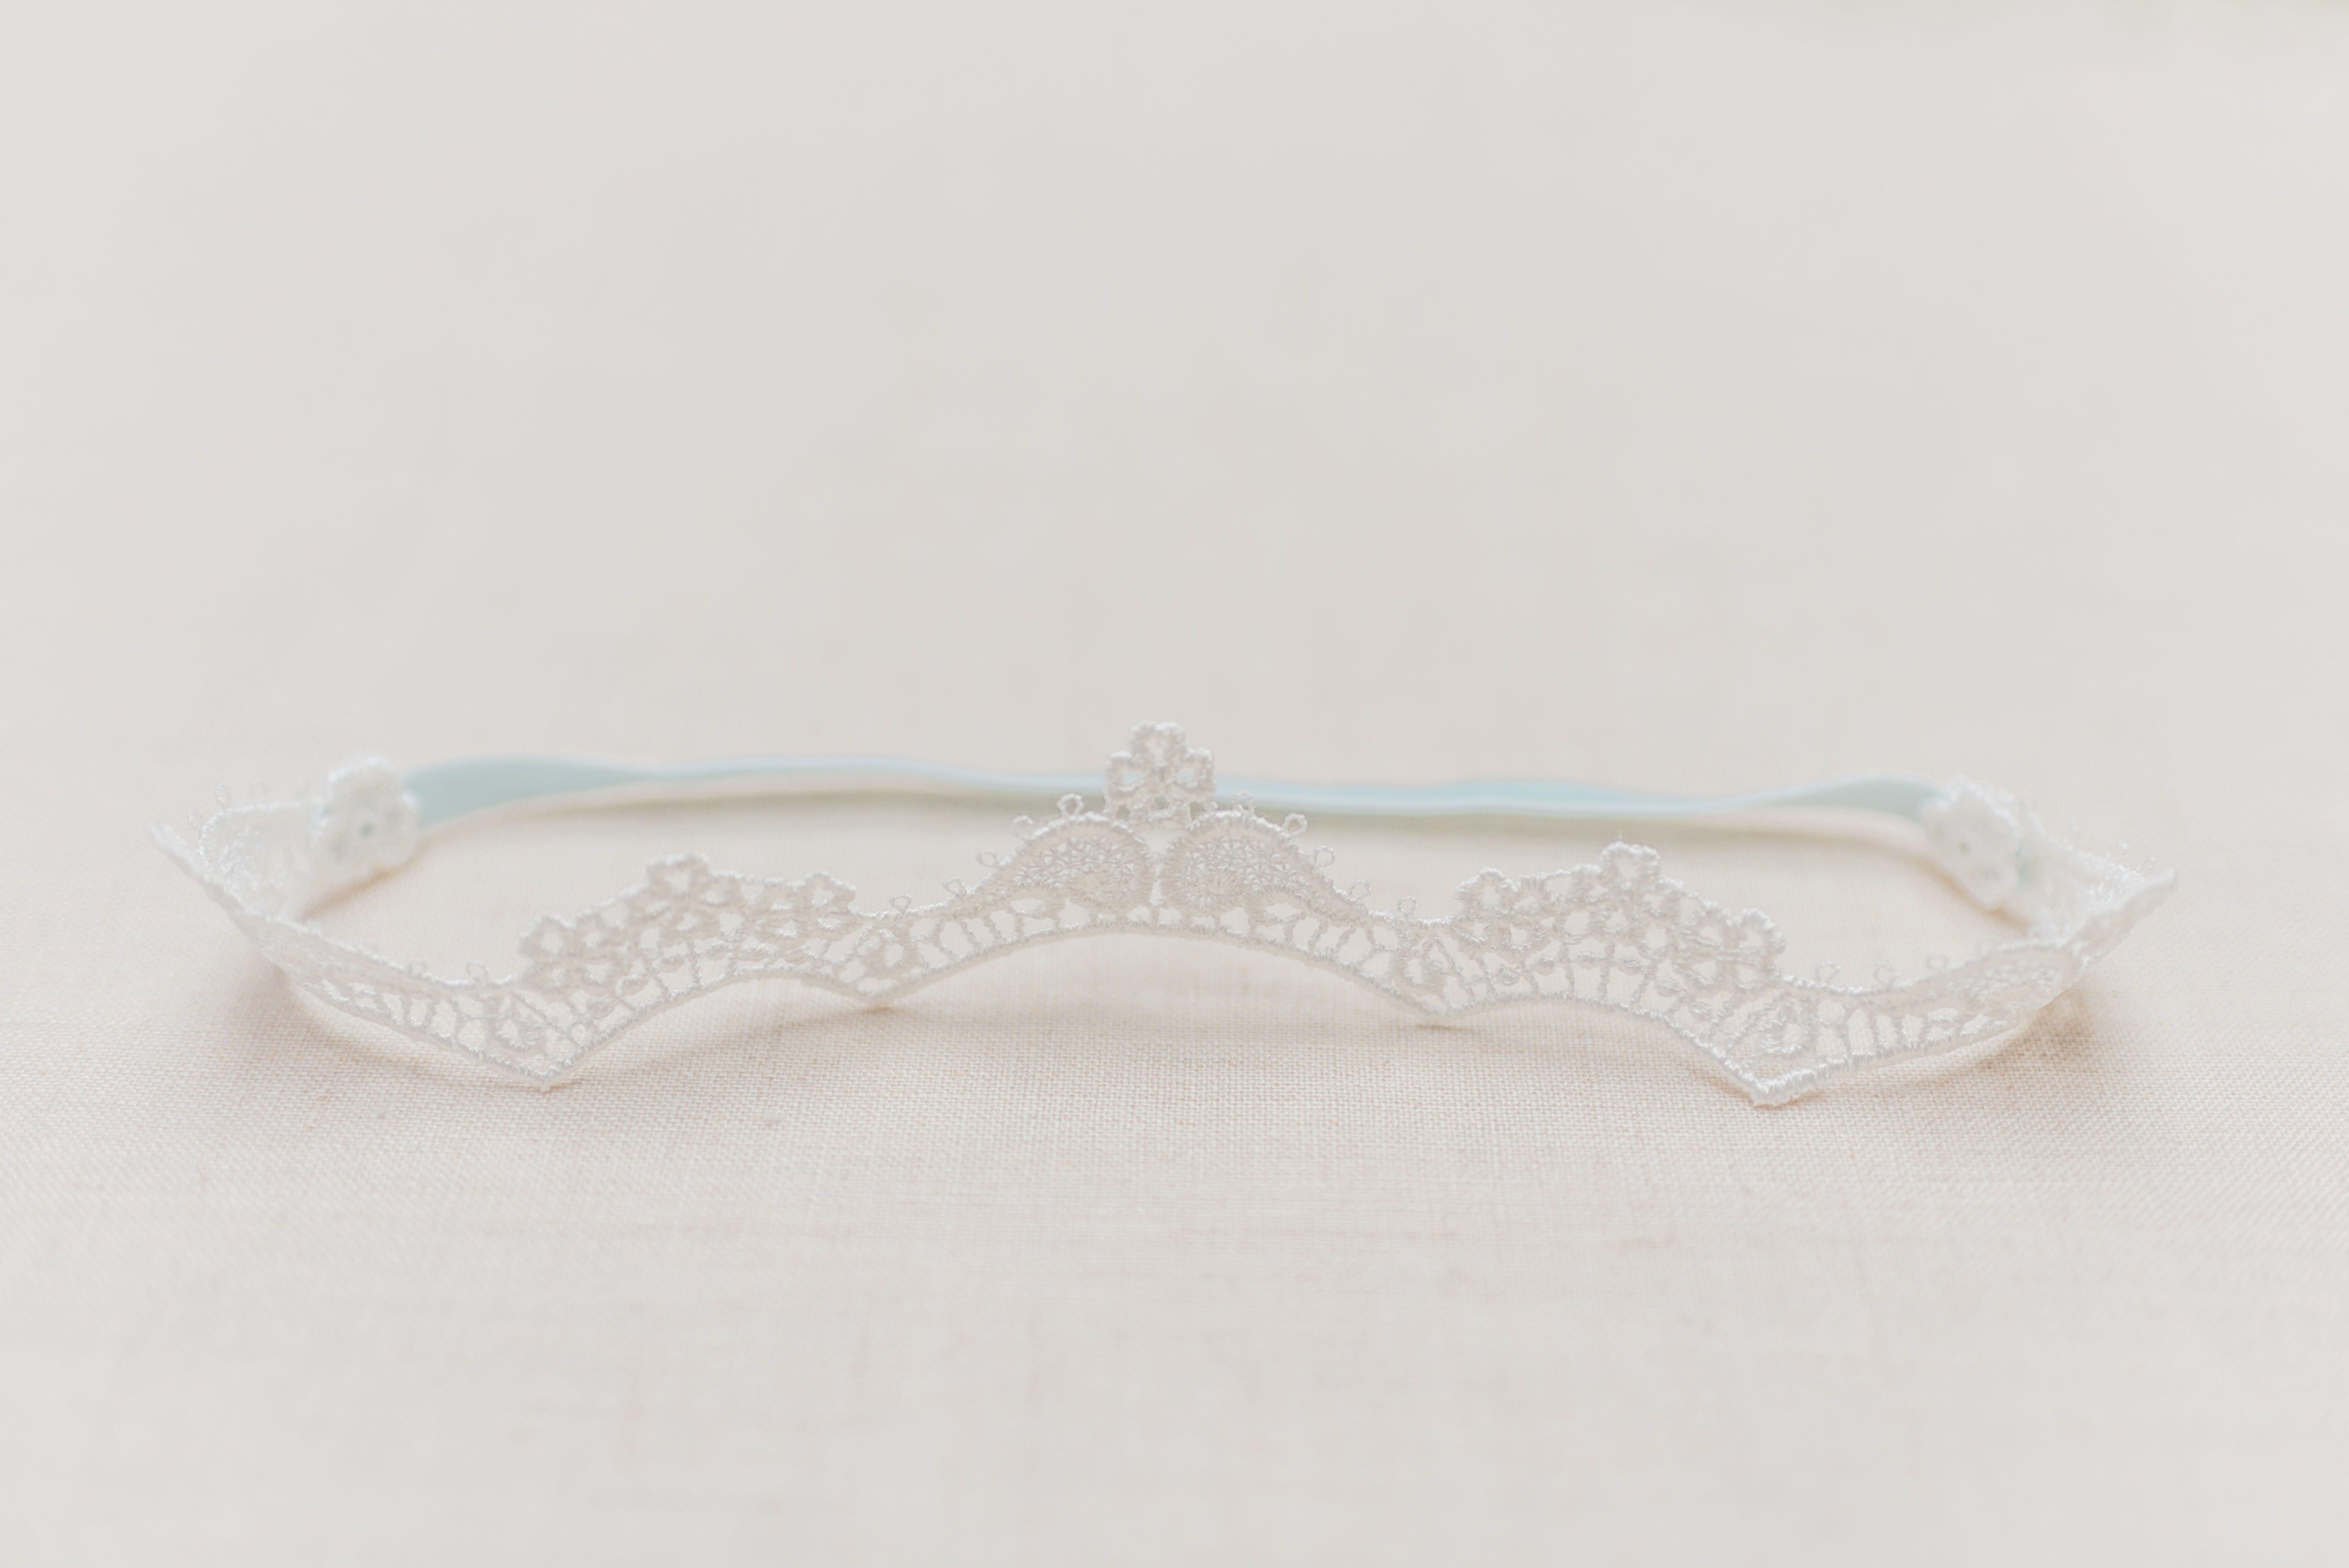 Dainty lace garter wedding garter set something blue